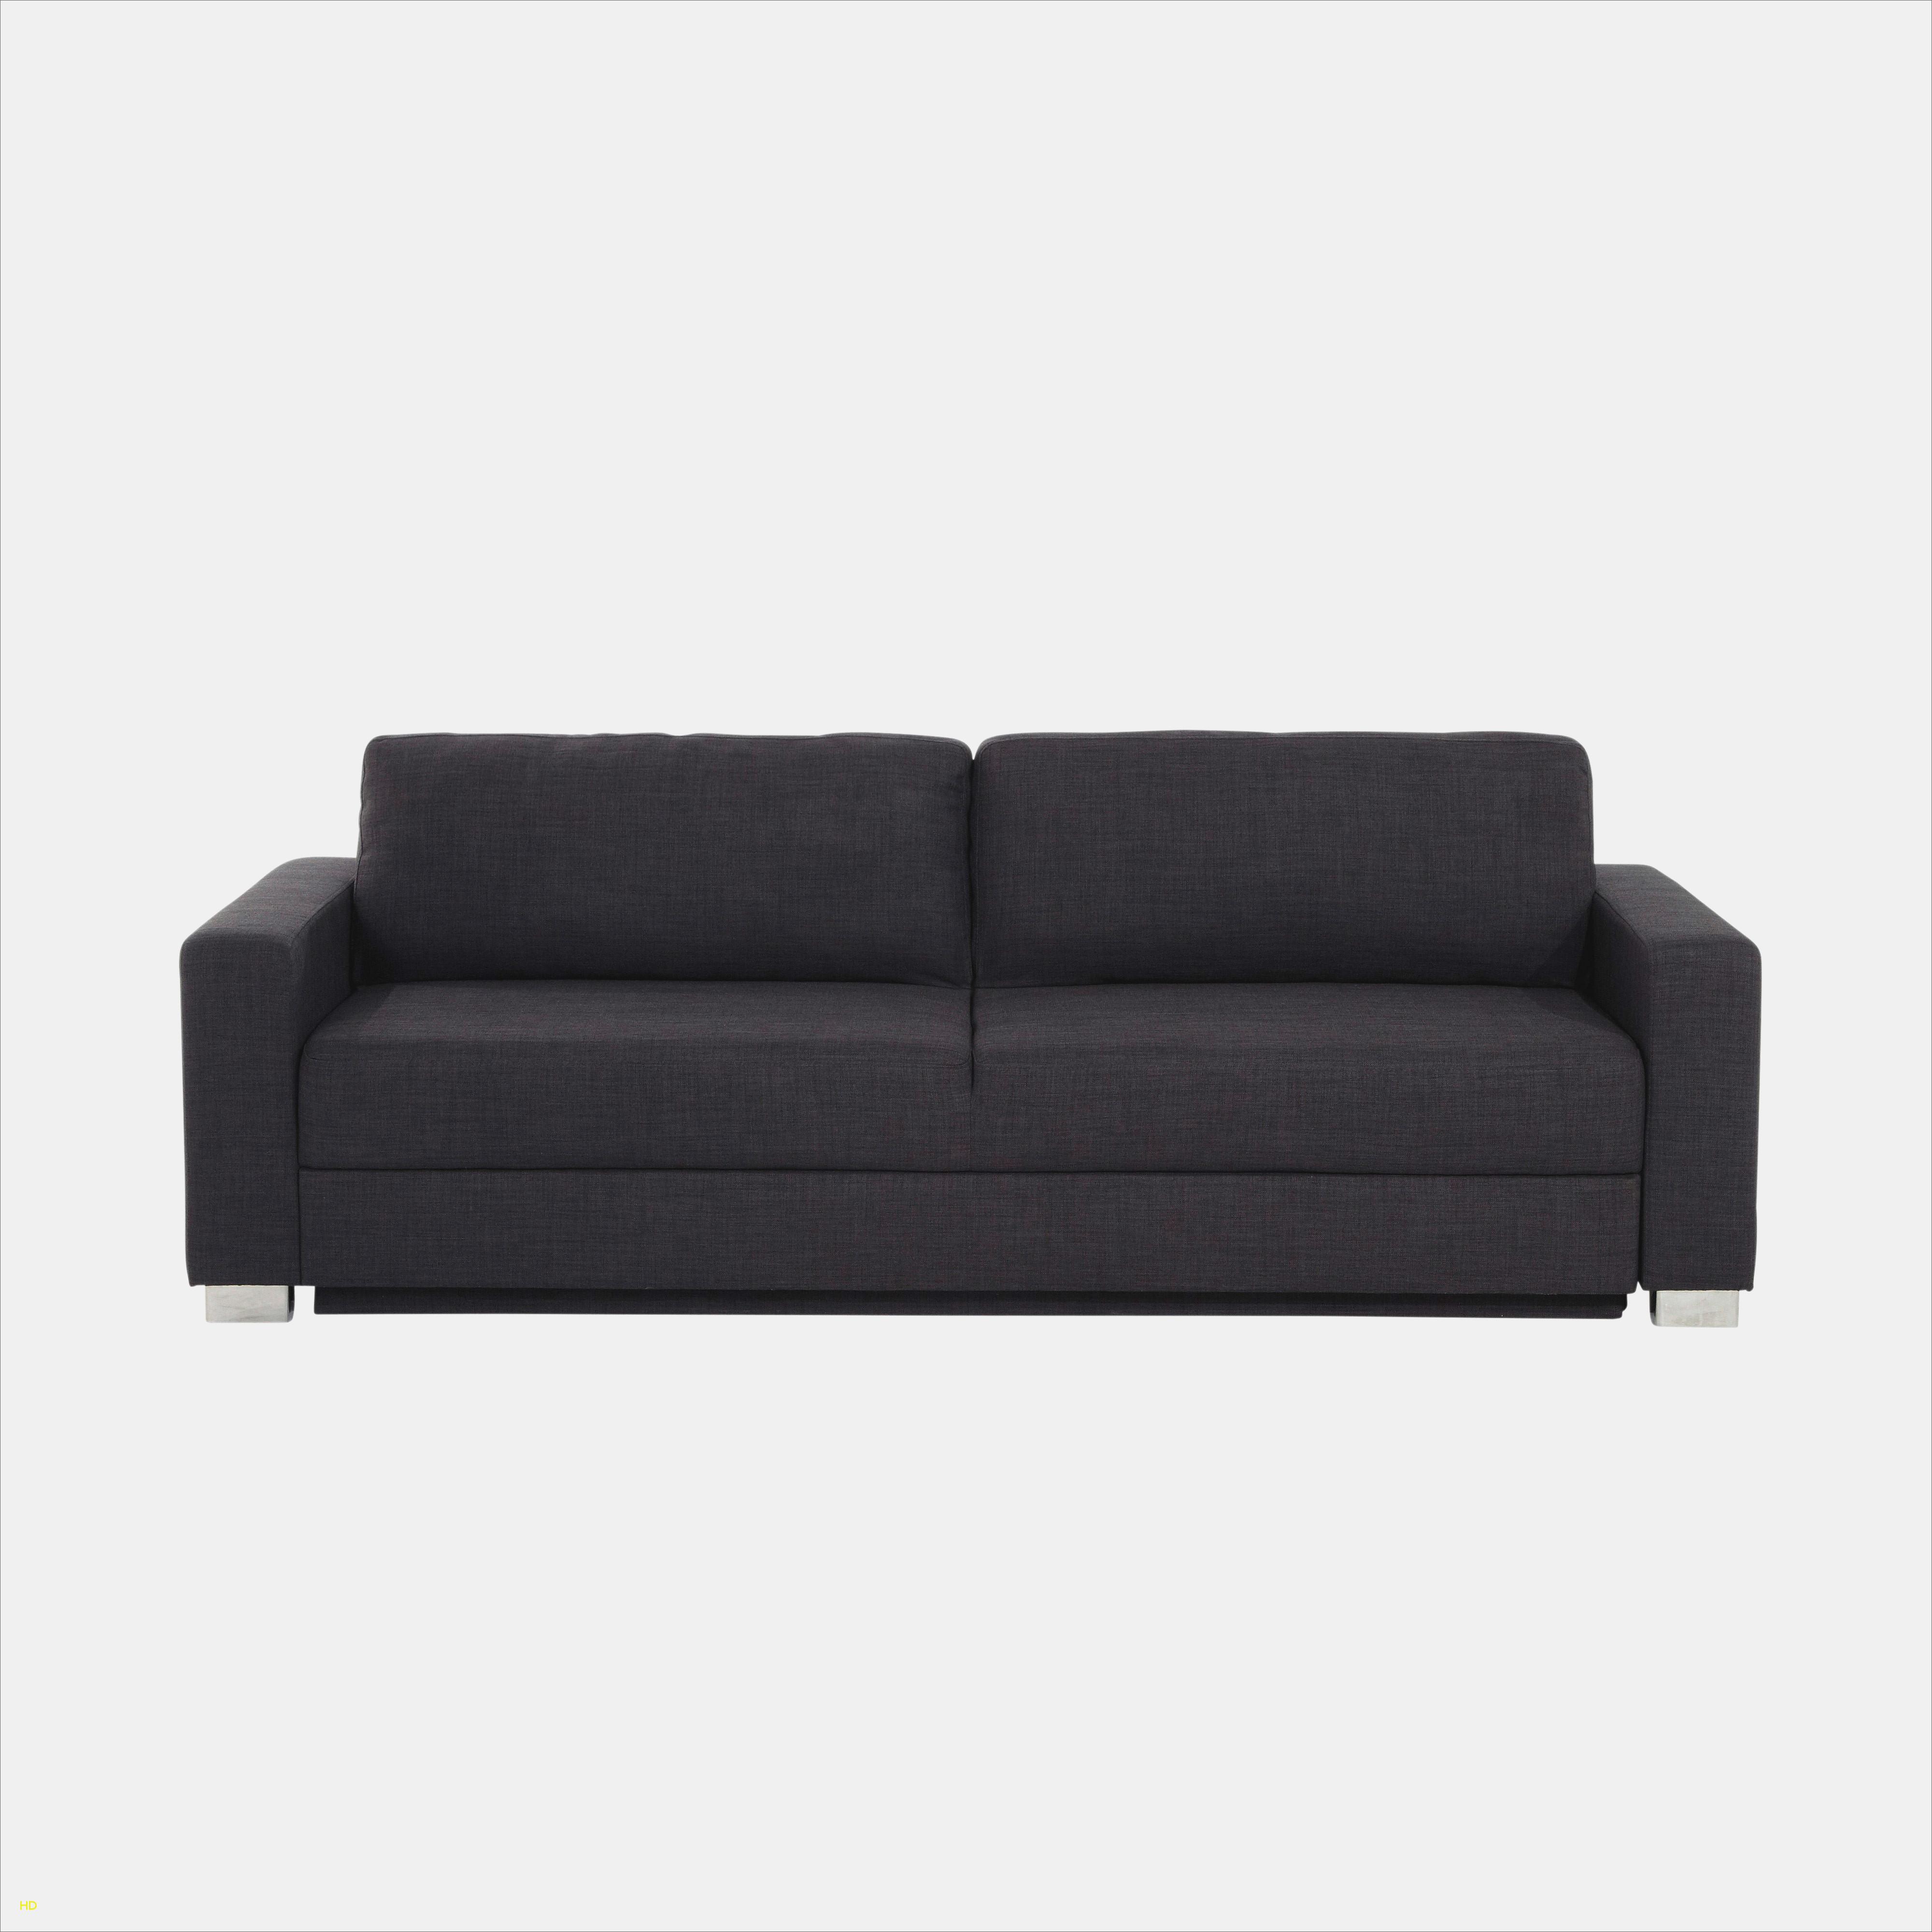 ikea canap 2 places convertible beau image 34. Black Bedroom Furniture Sets. Home Design Ideas